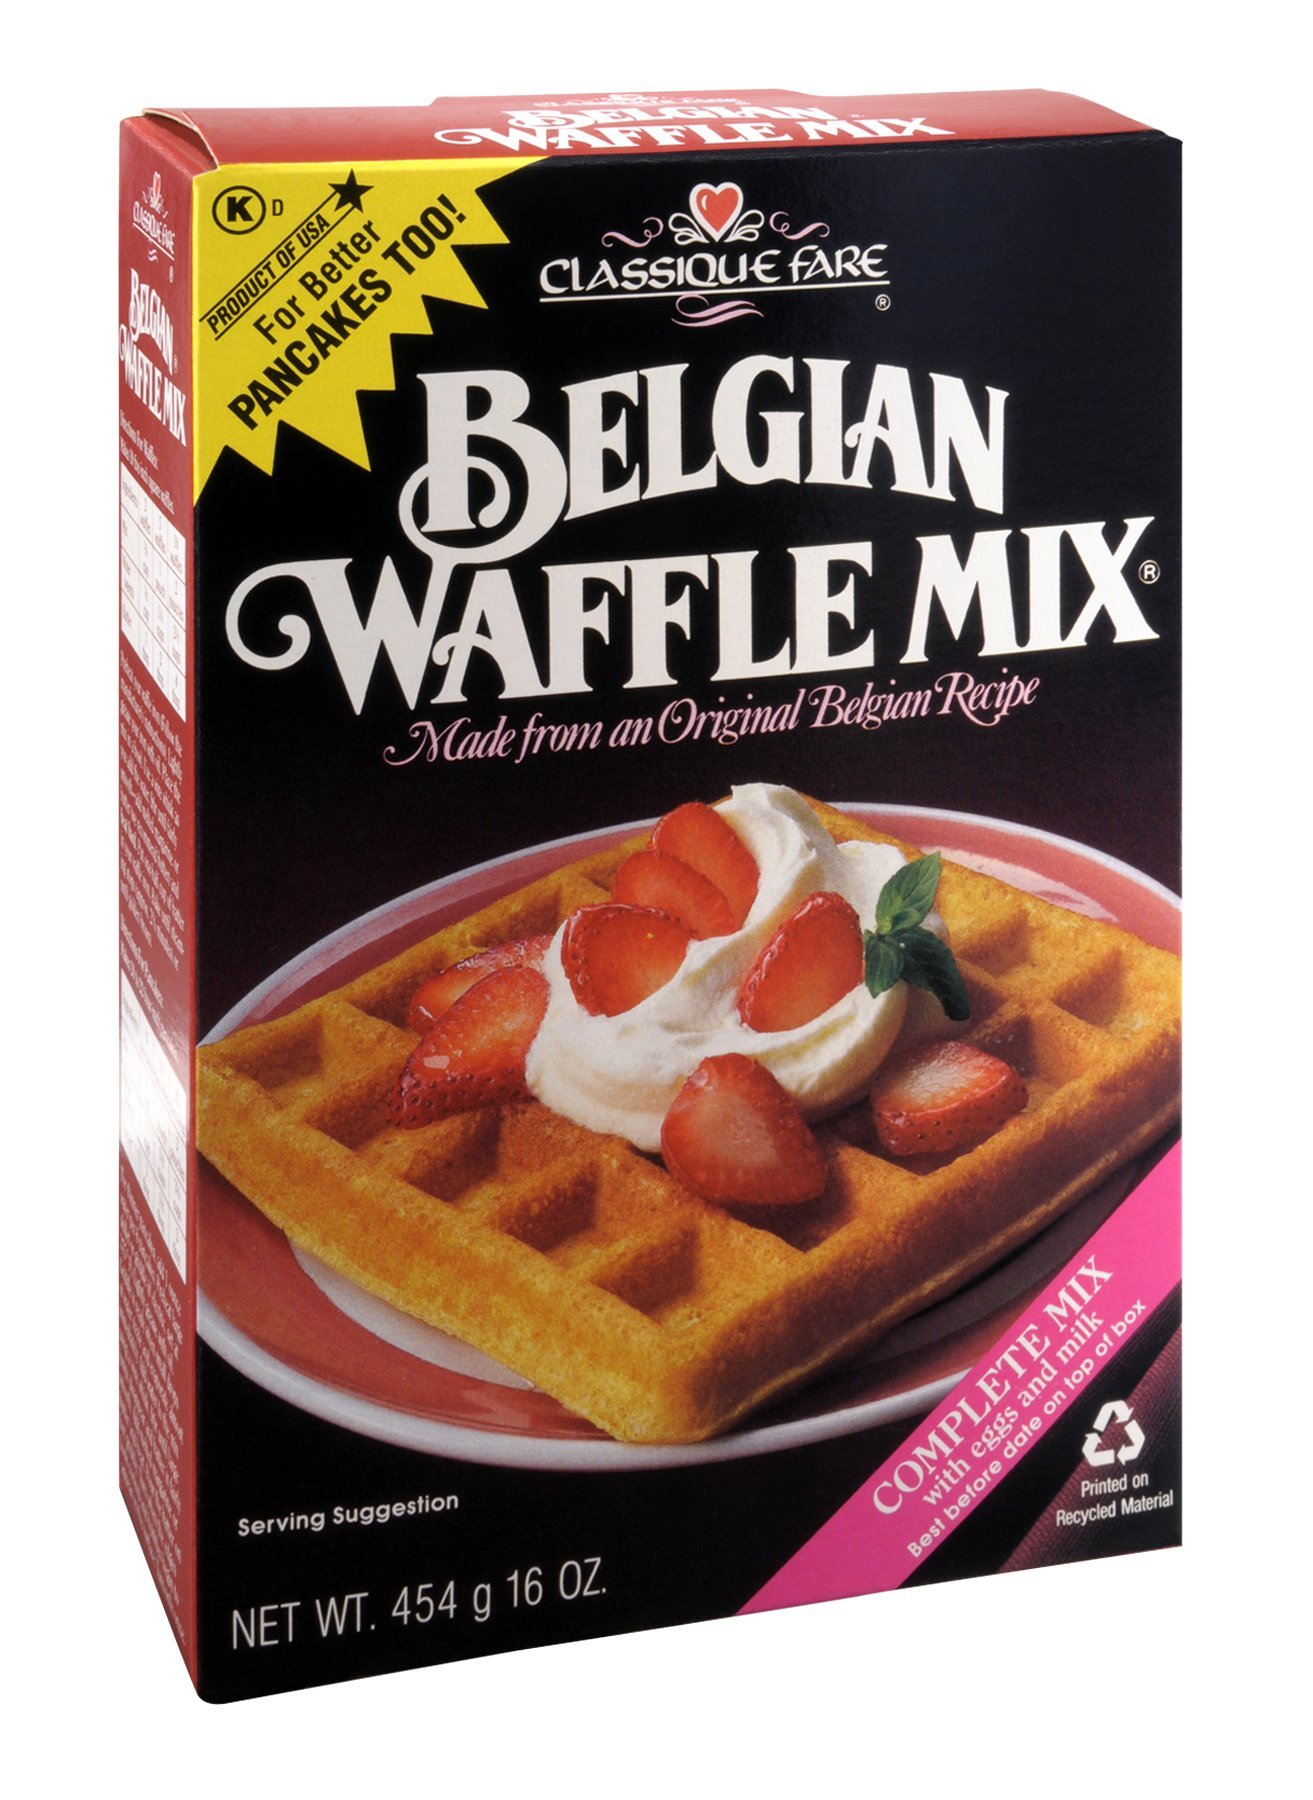 Classique Fare Mix Waffle Belgian